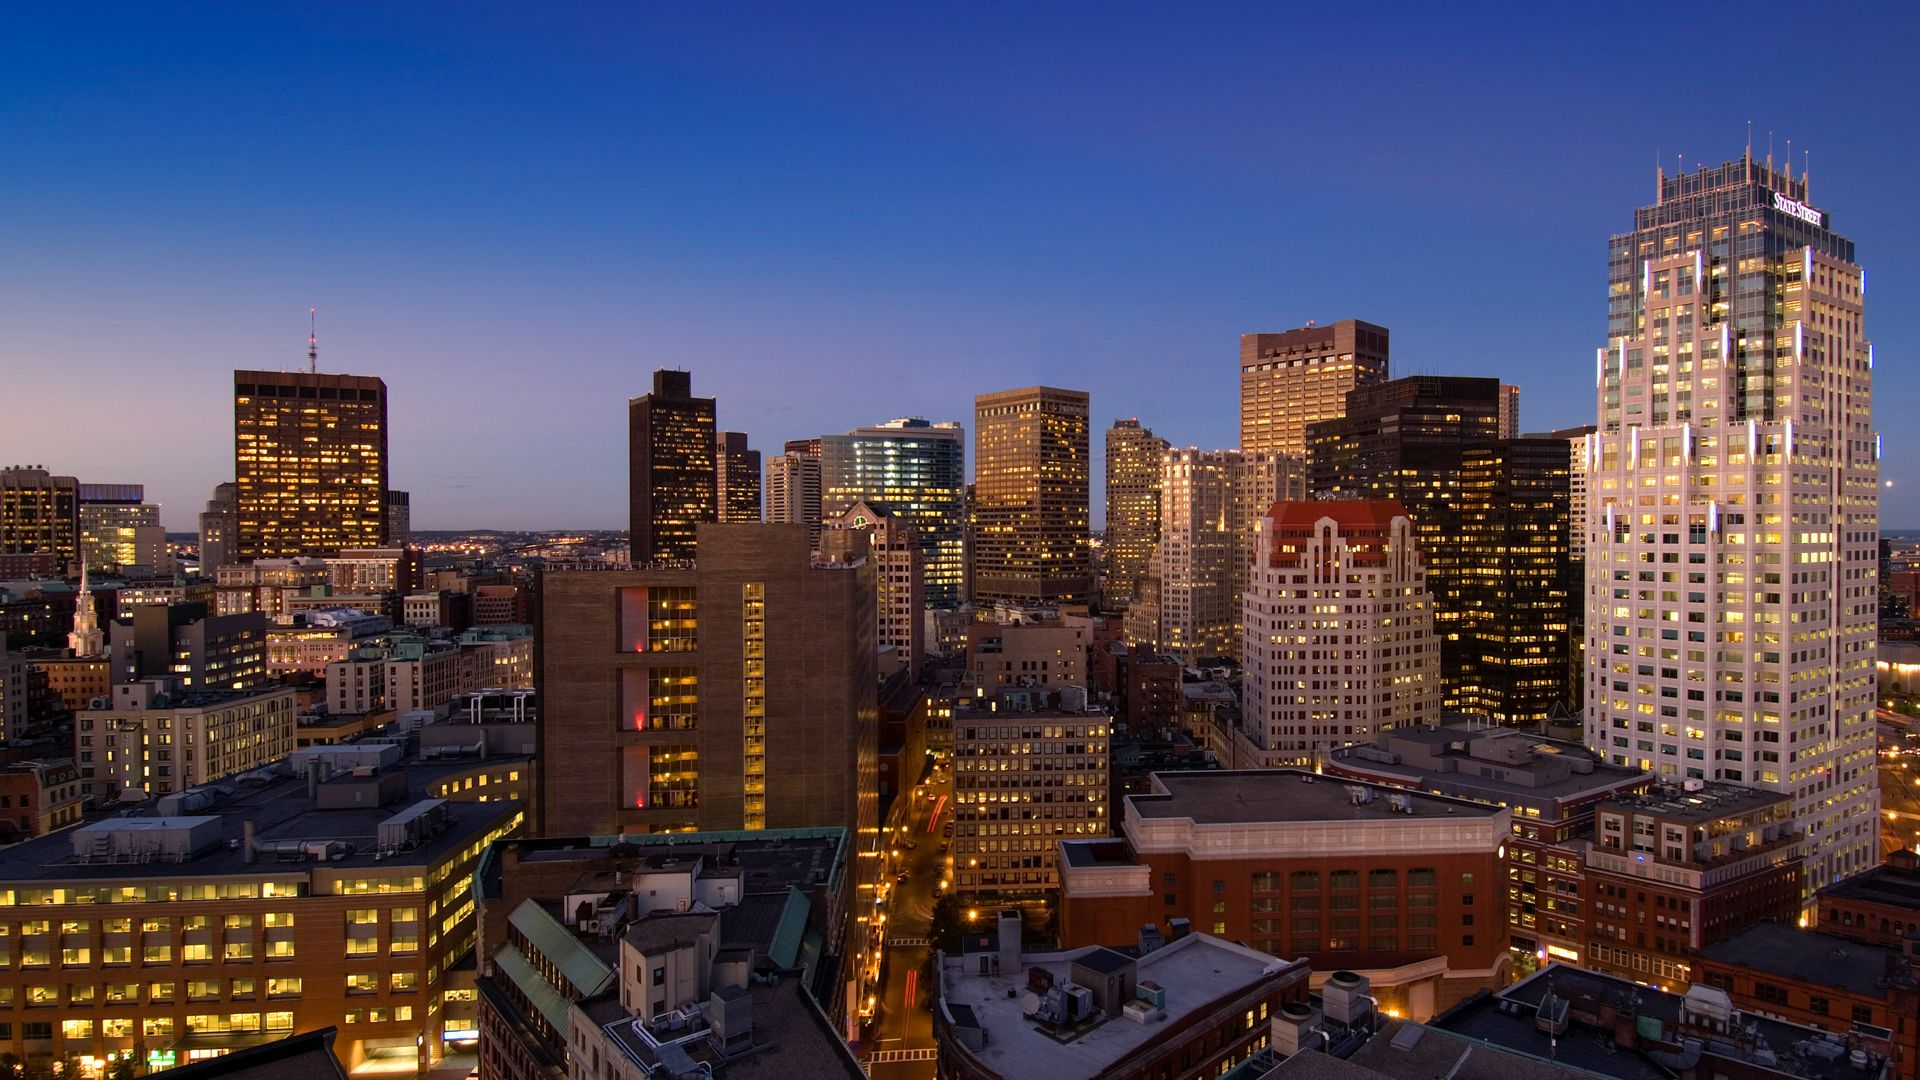 660 Washington Apartments - Views